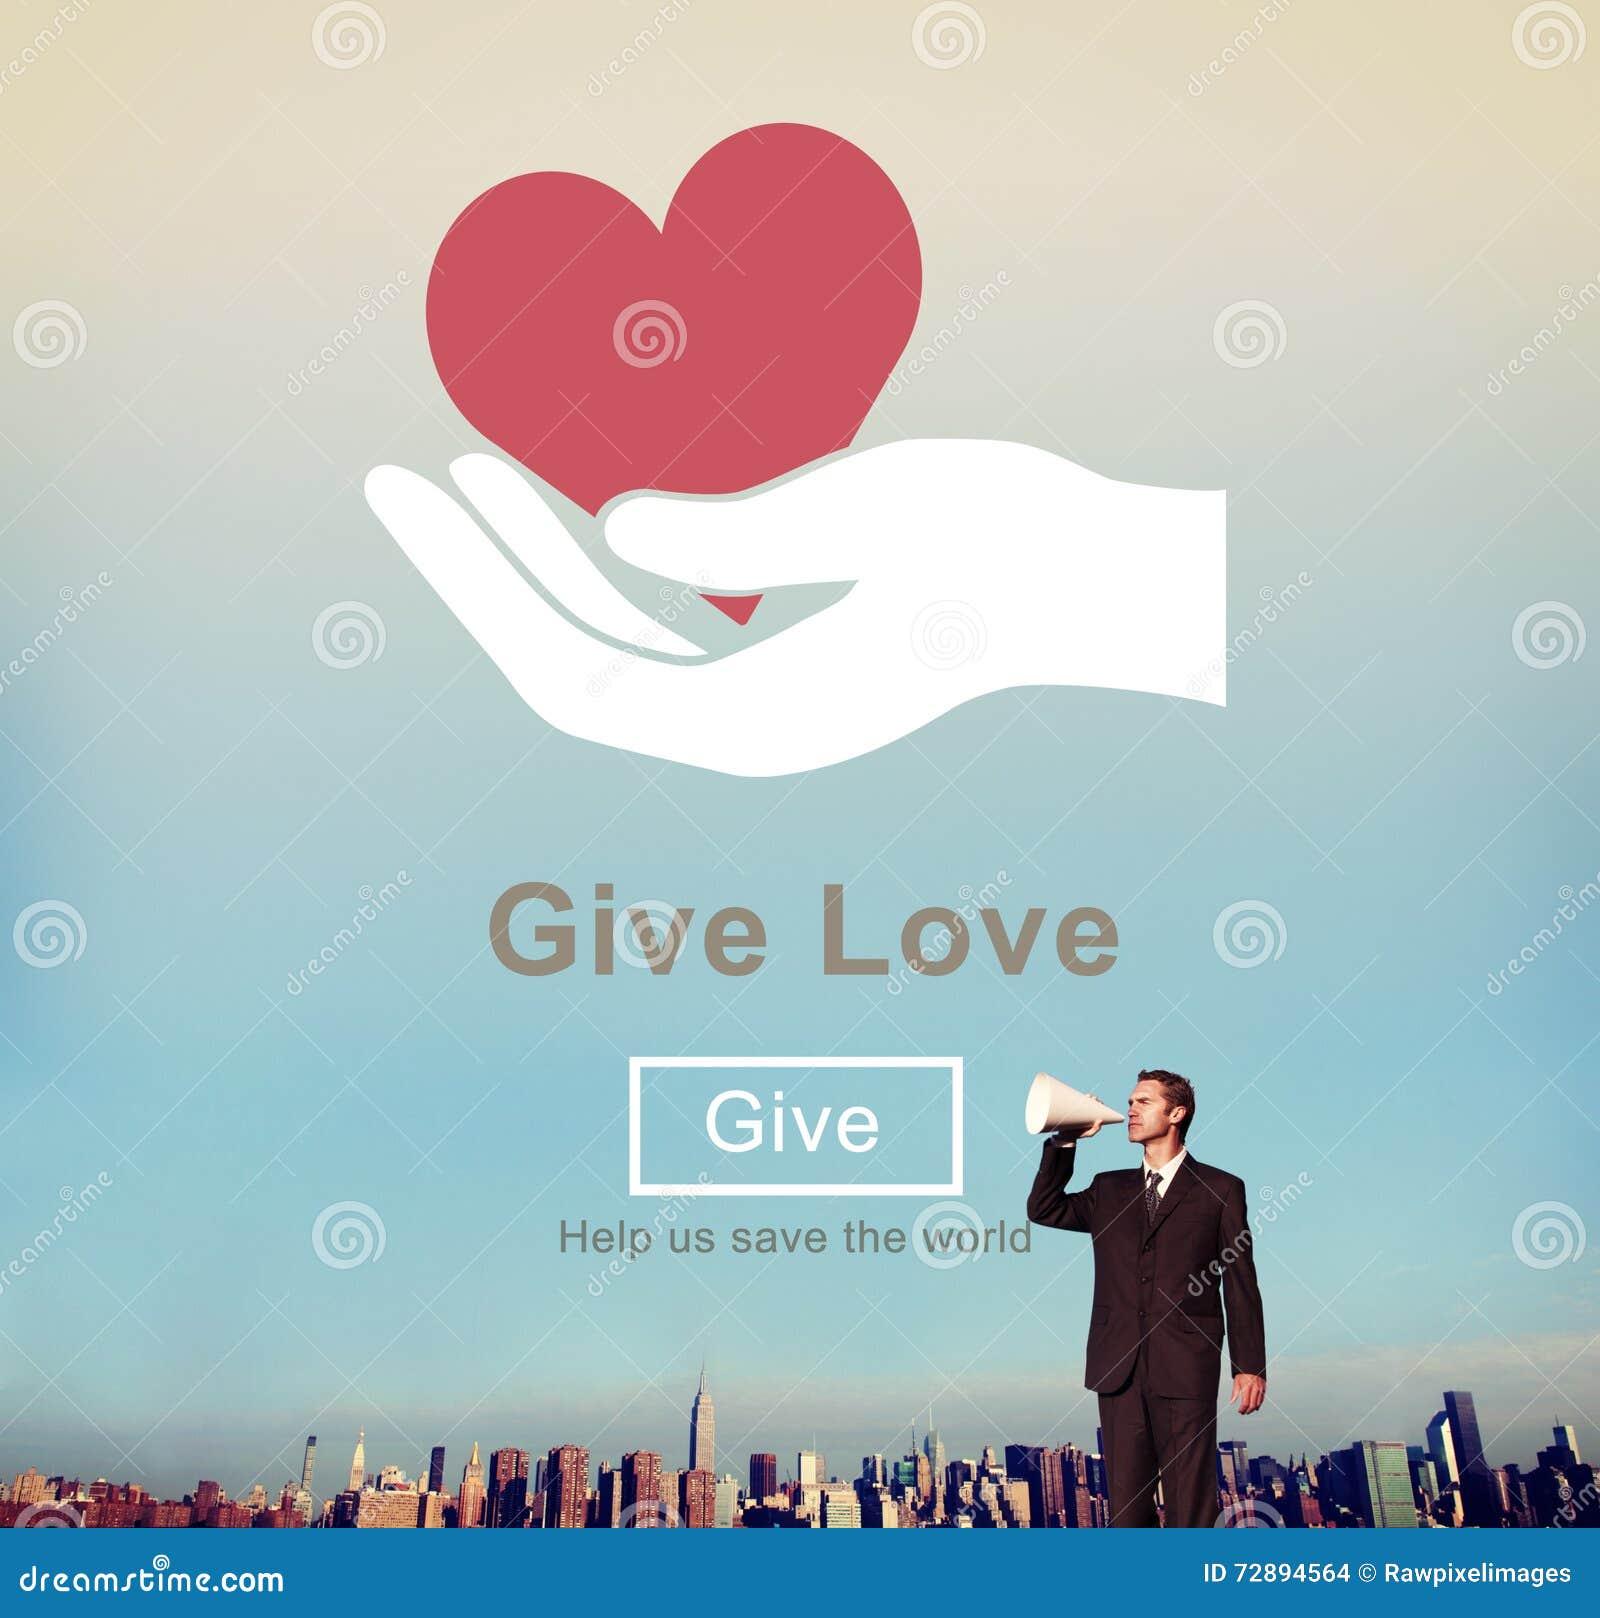 Give love 49